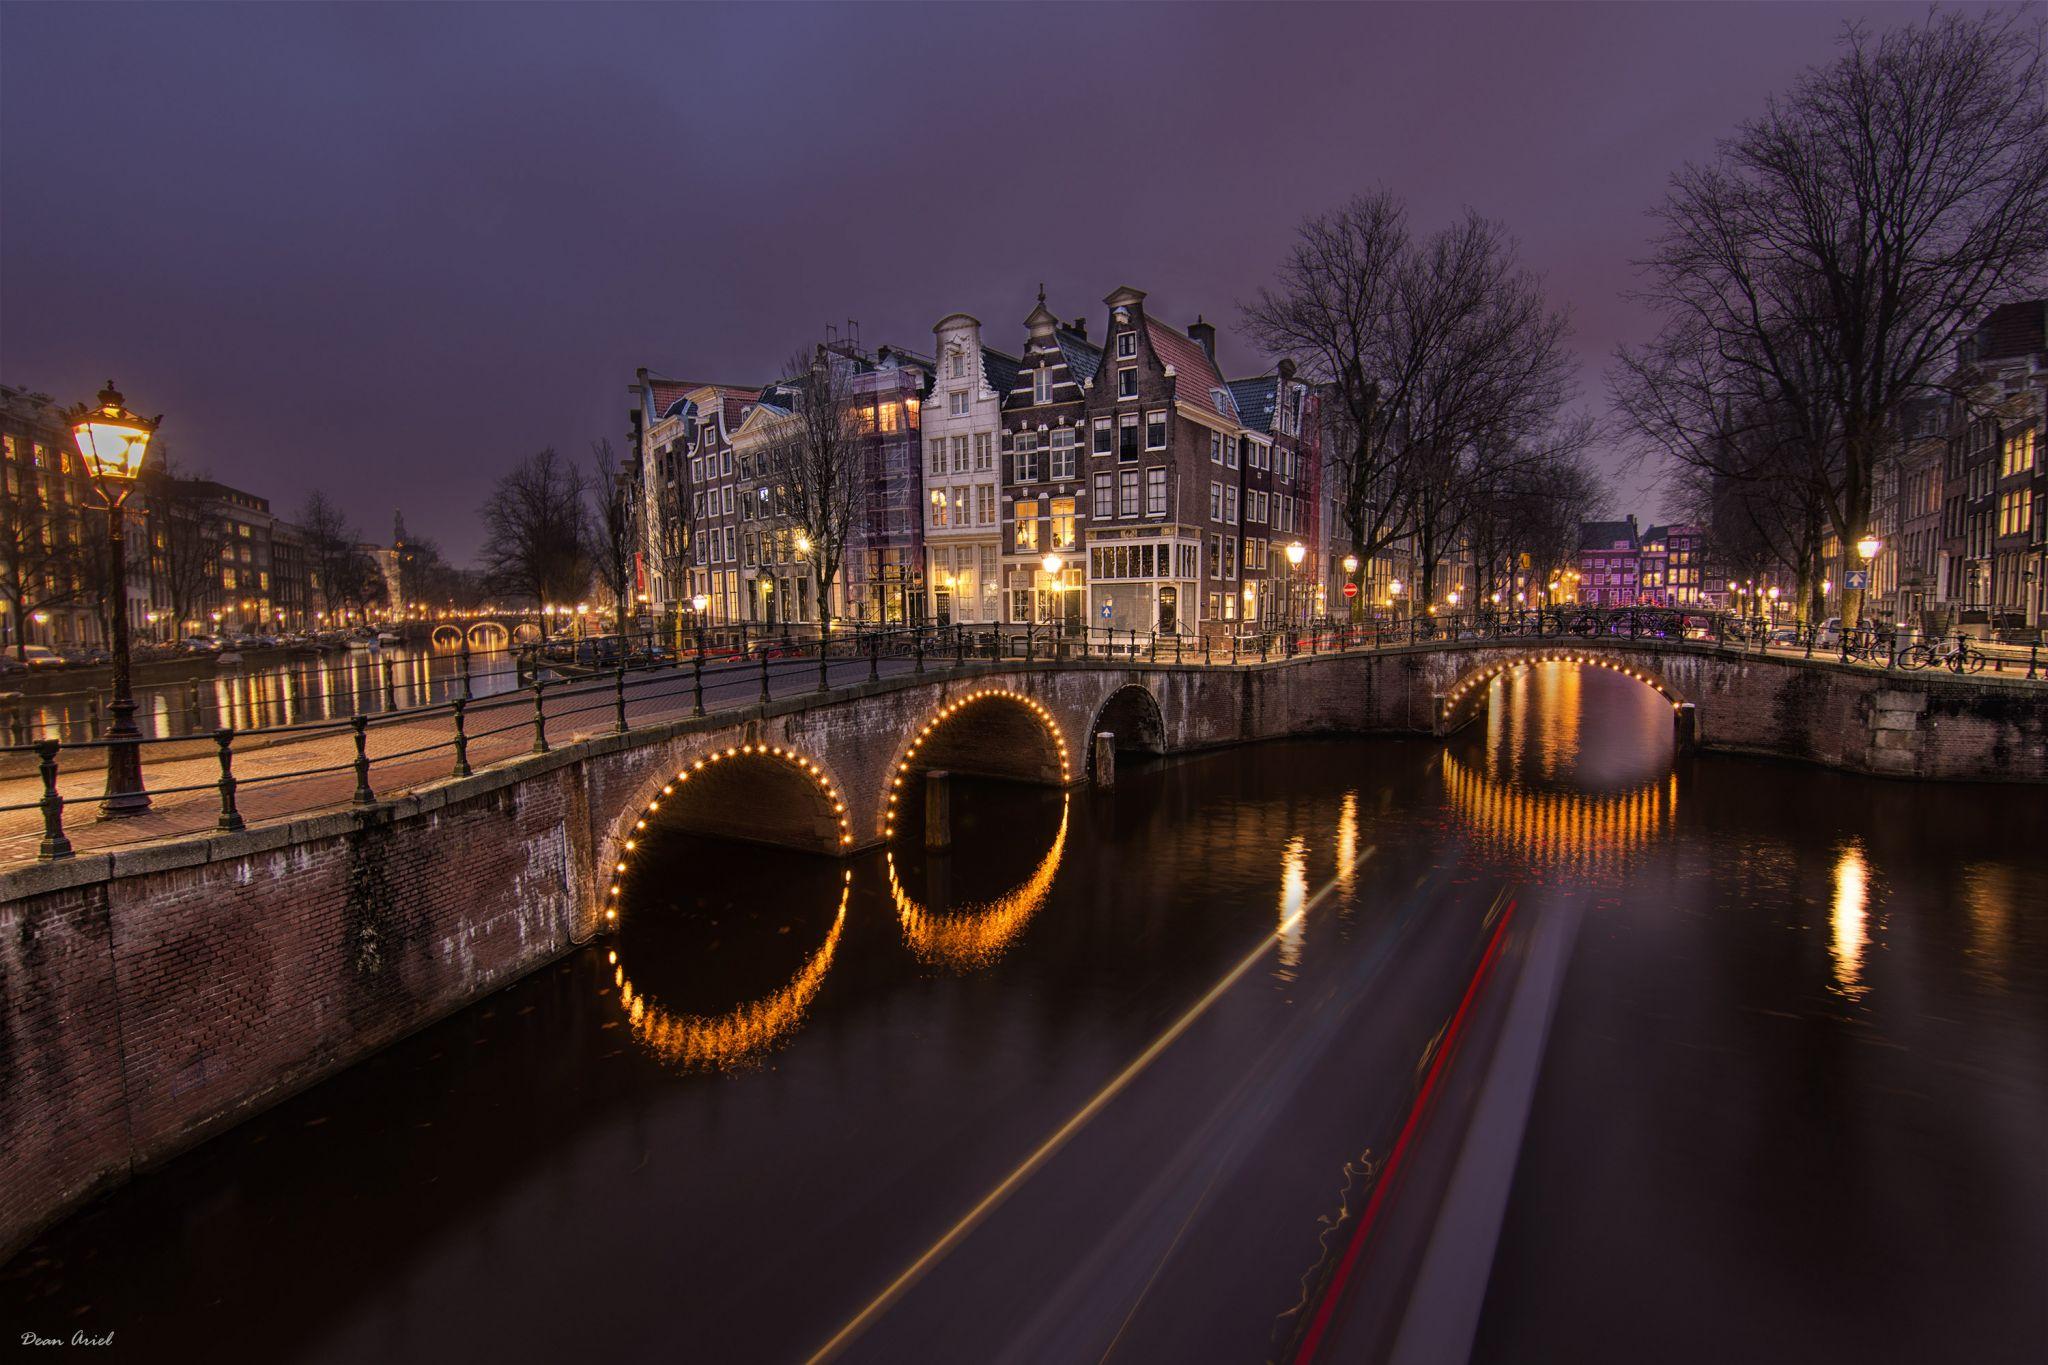 Amsterdam Keizersgracht, Netherlands